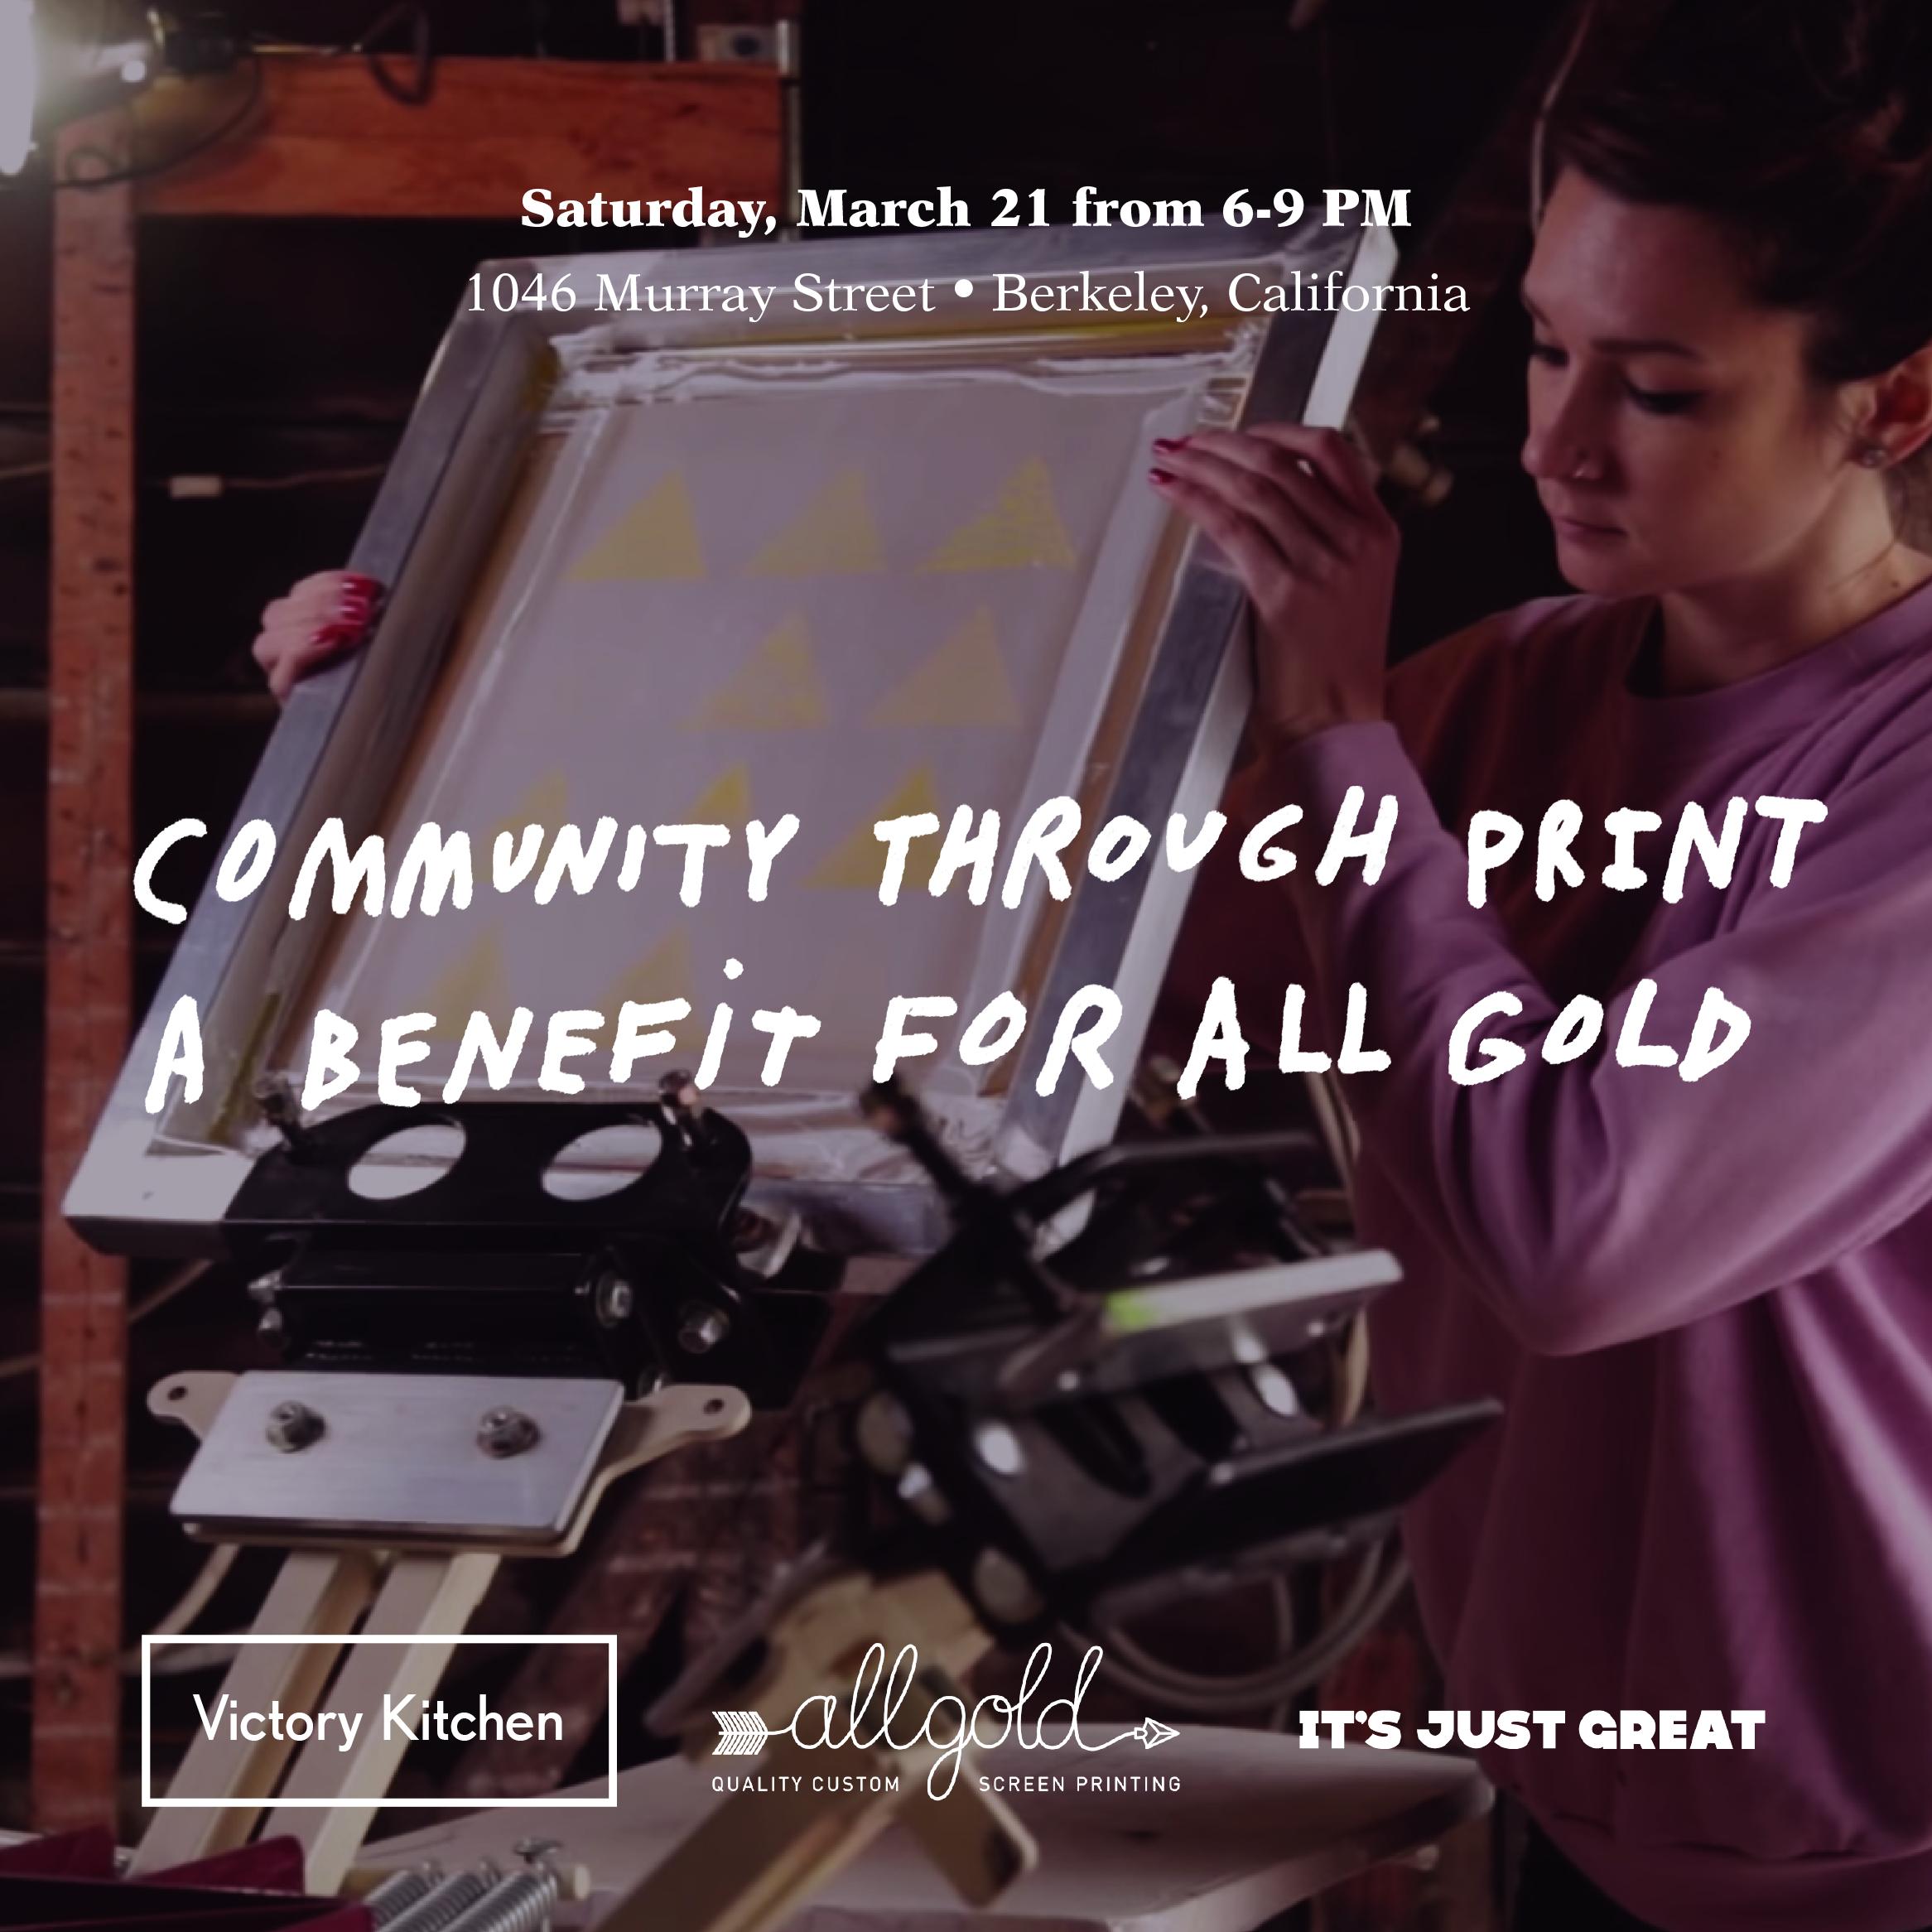 CommunityThroughPrint-Flyer-01.png